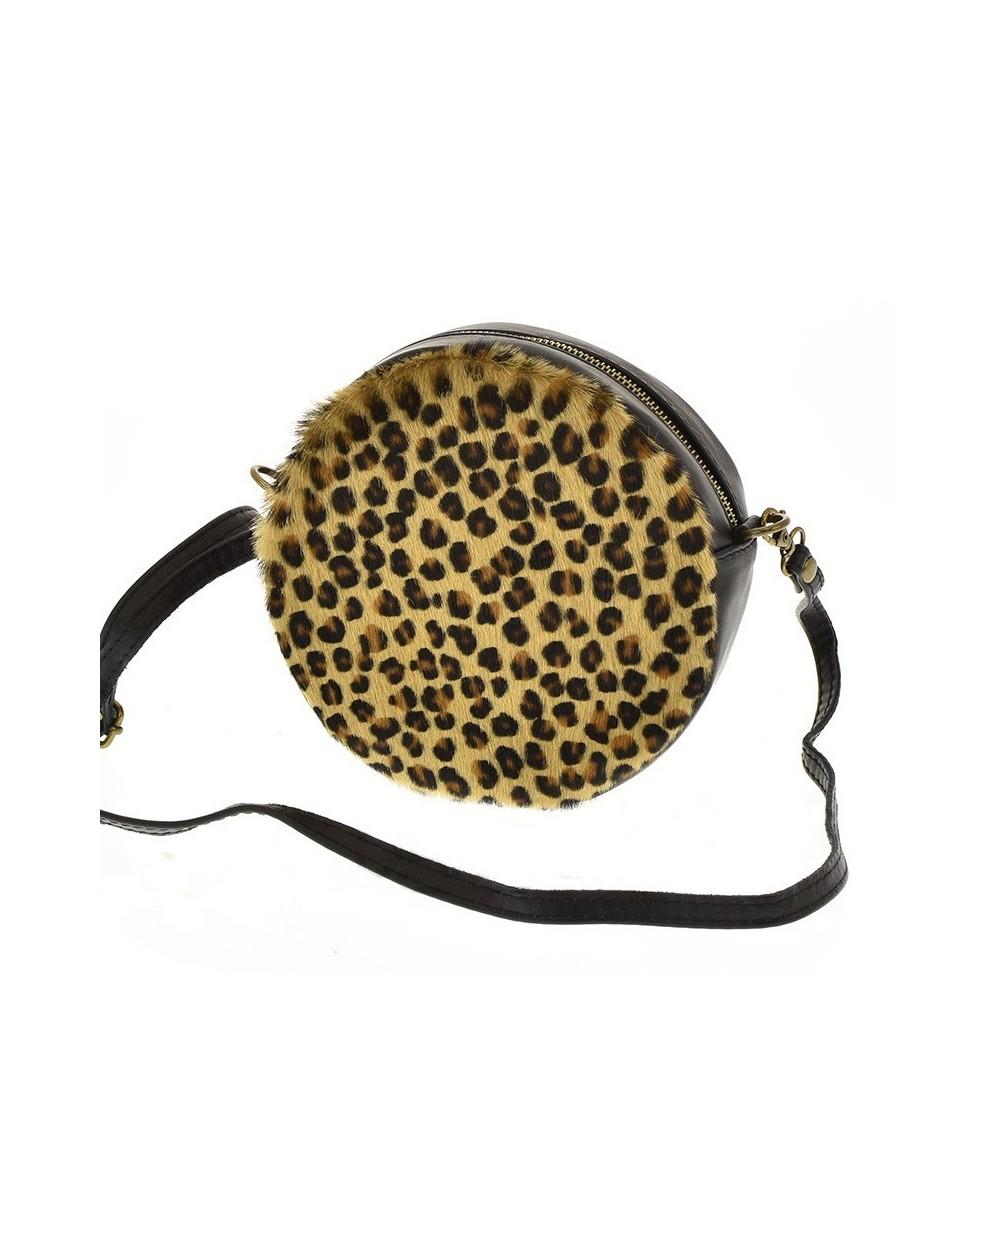 Okrągła torebka torebka z futerkiem panterka